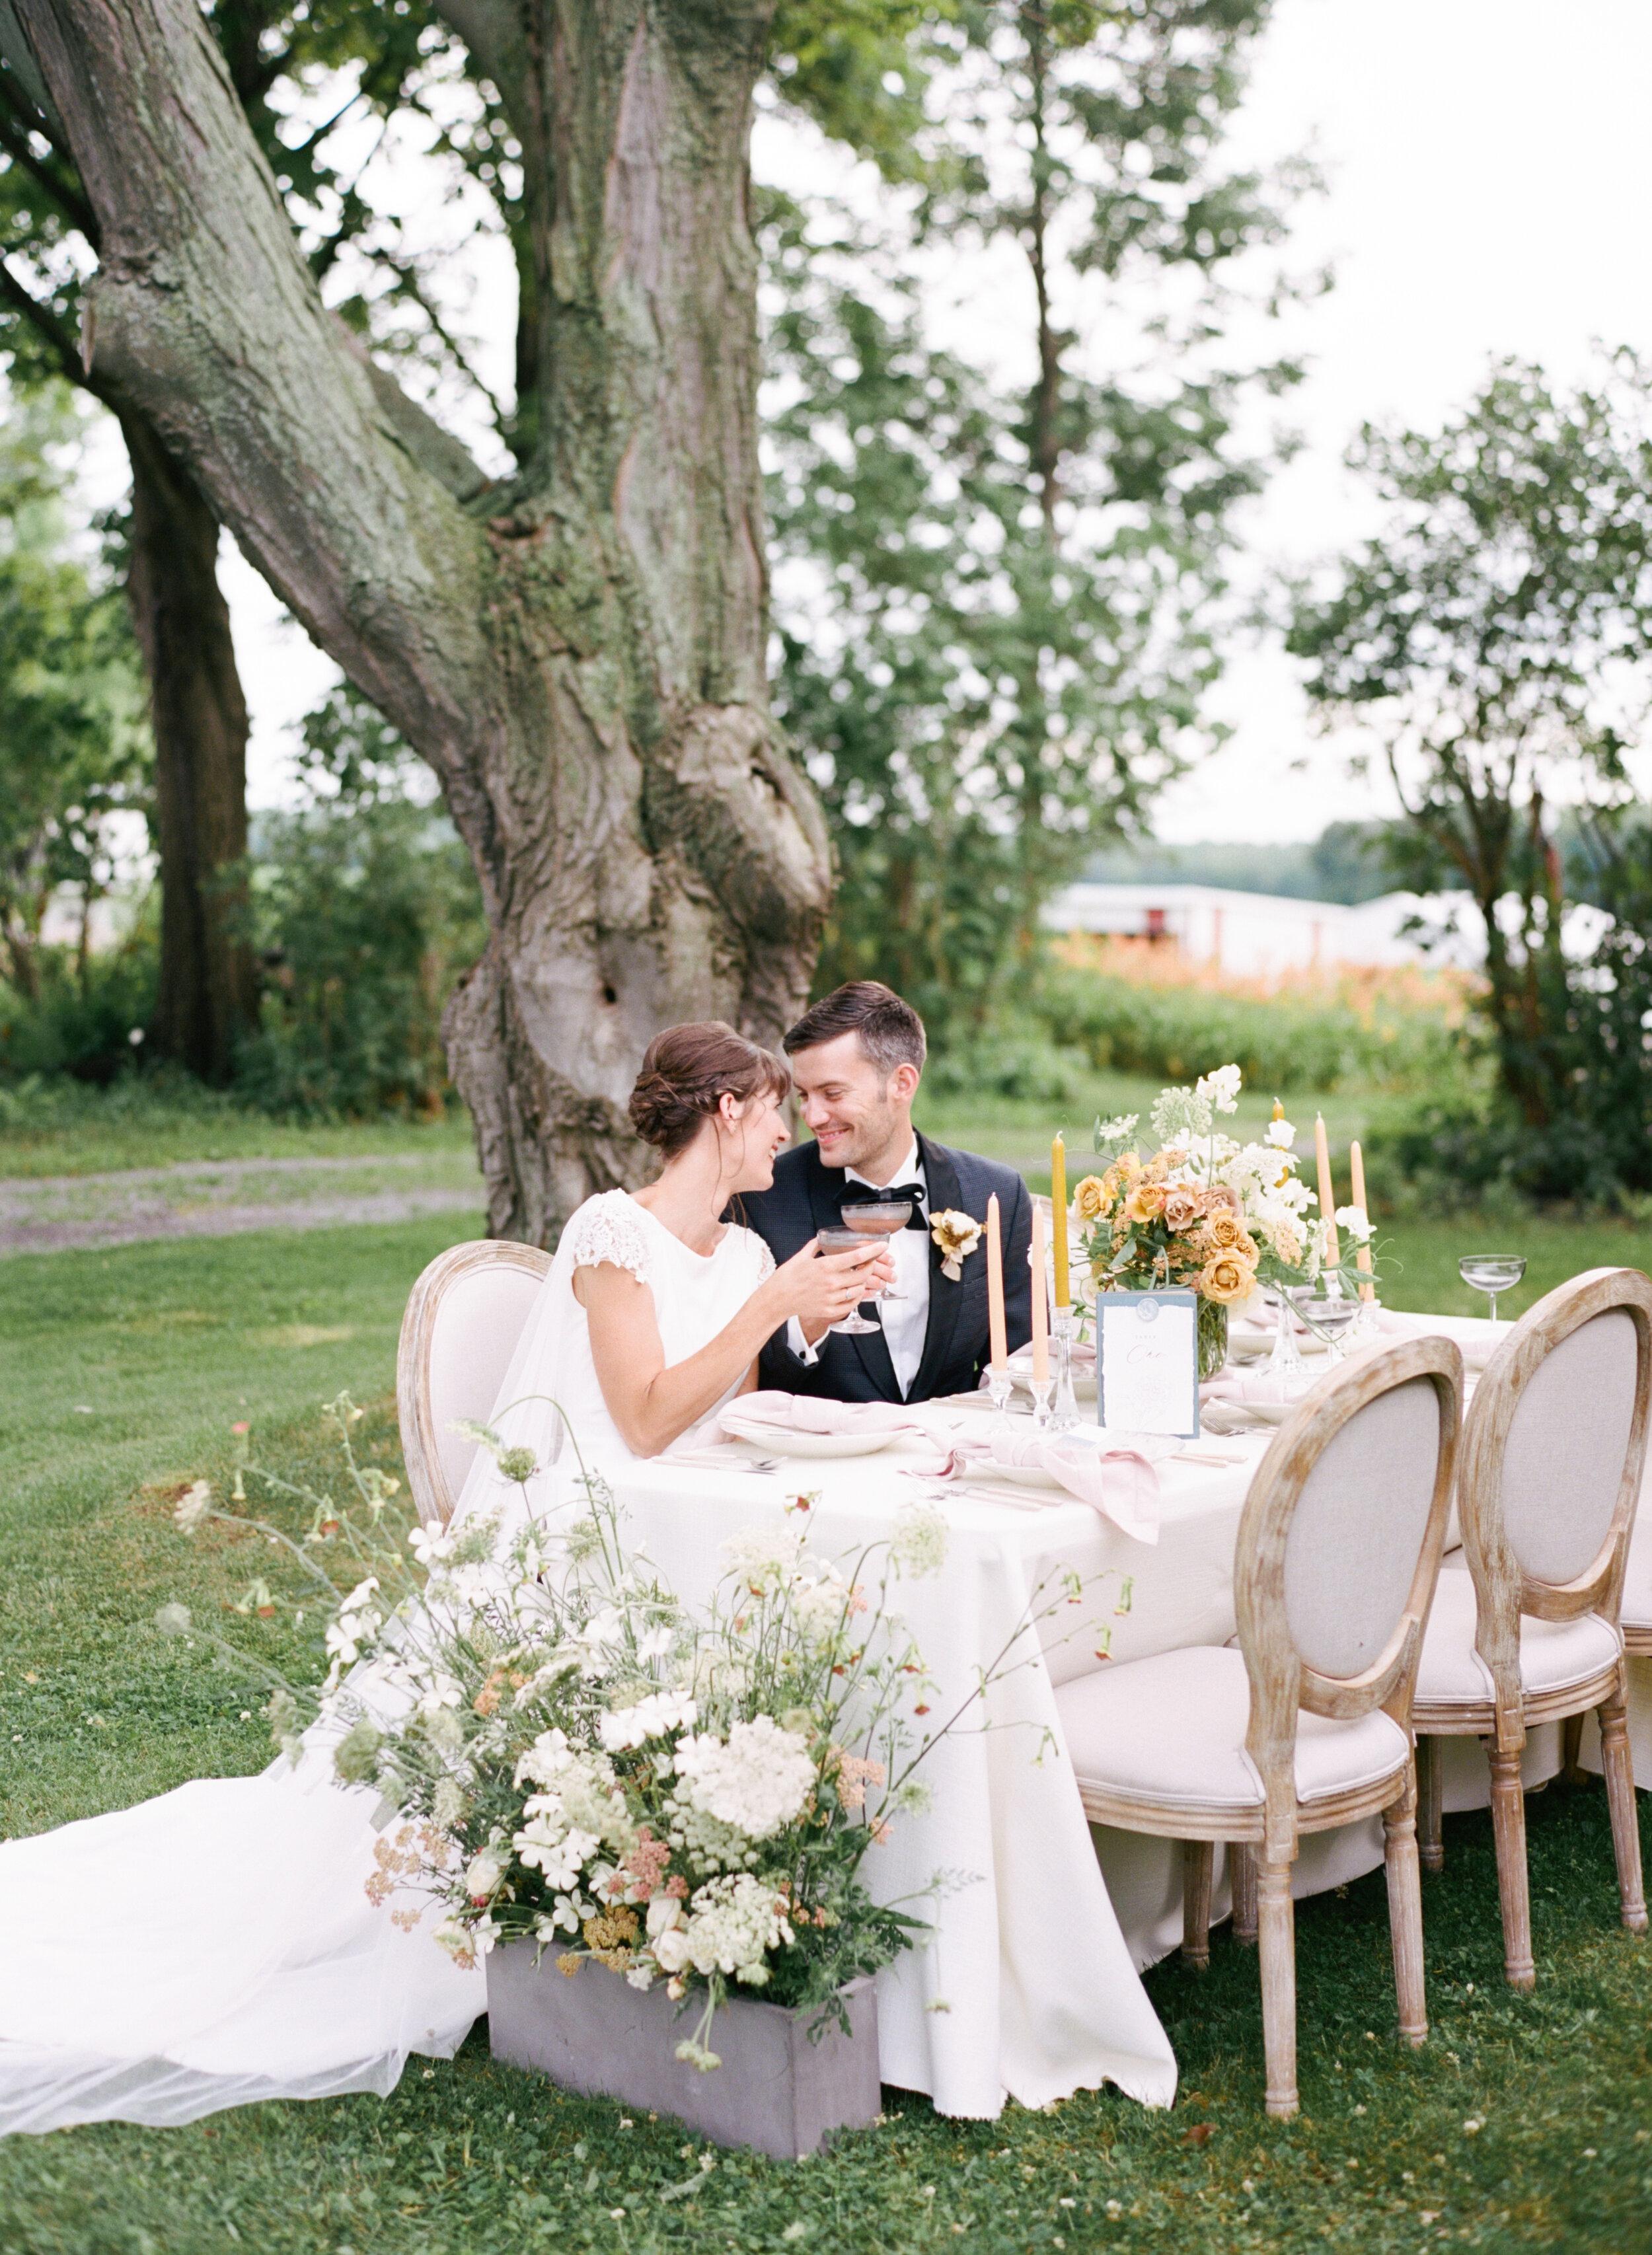 alexandra-meseke-understated-soft-luxury-wedding-upstate-ny_0097.jpg